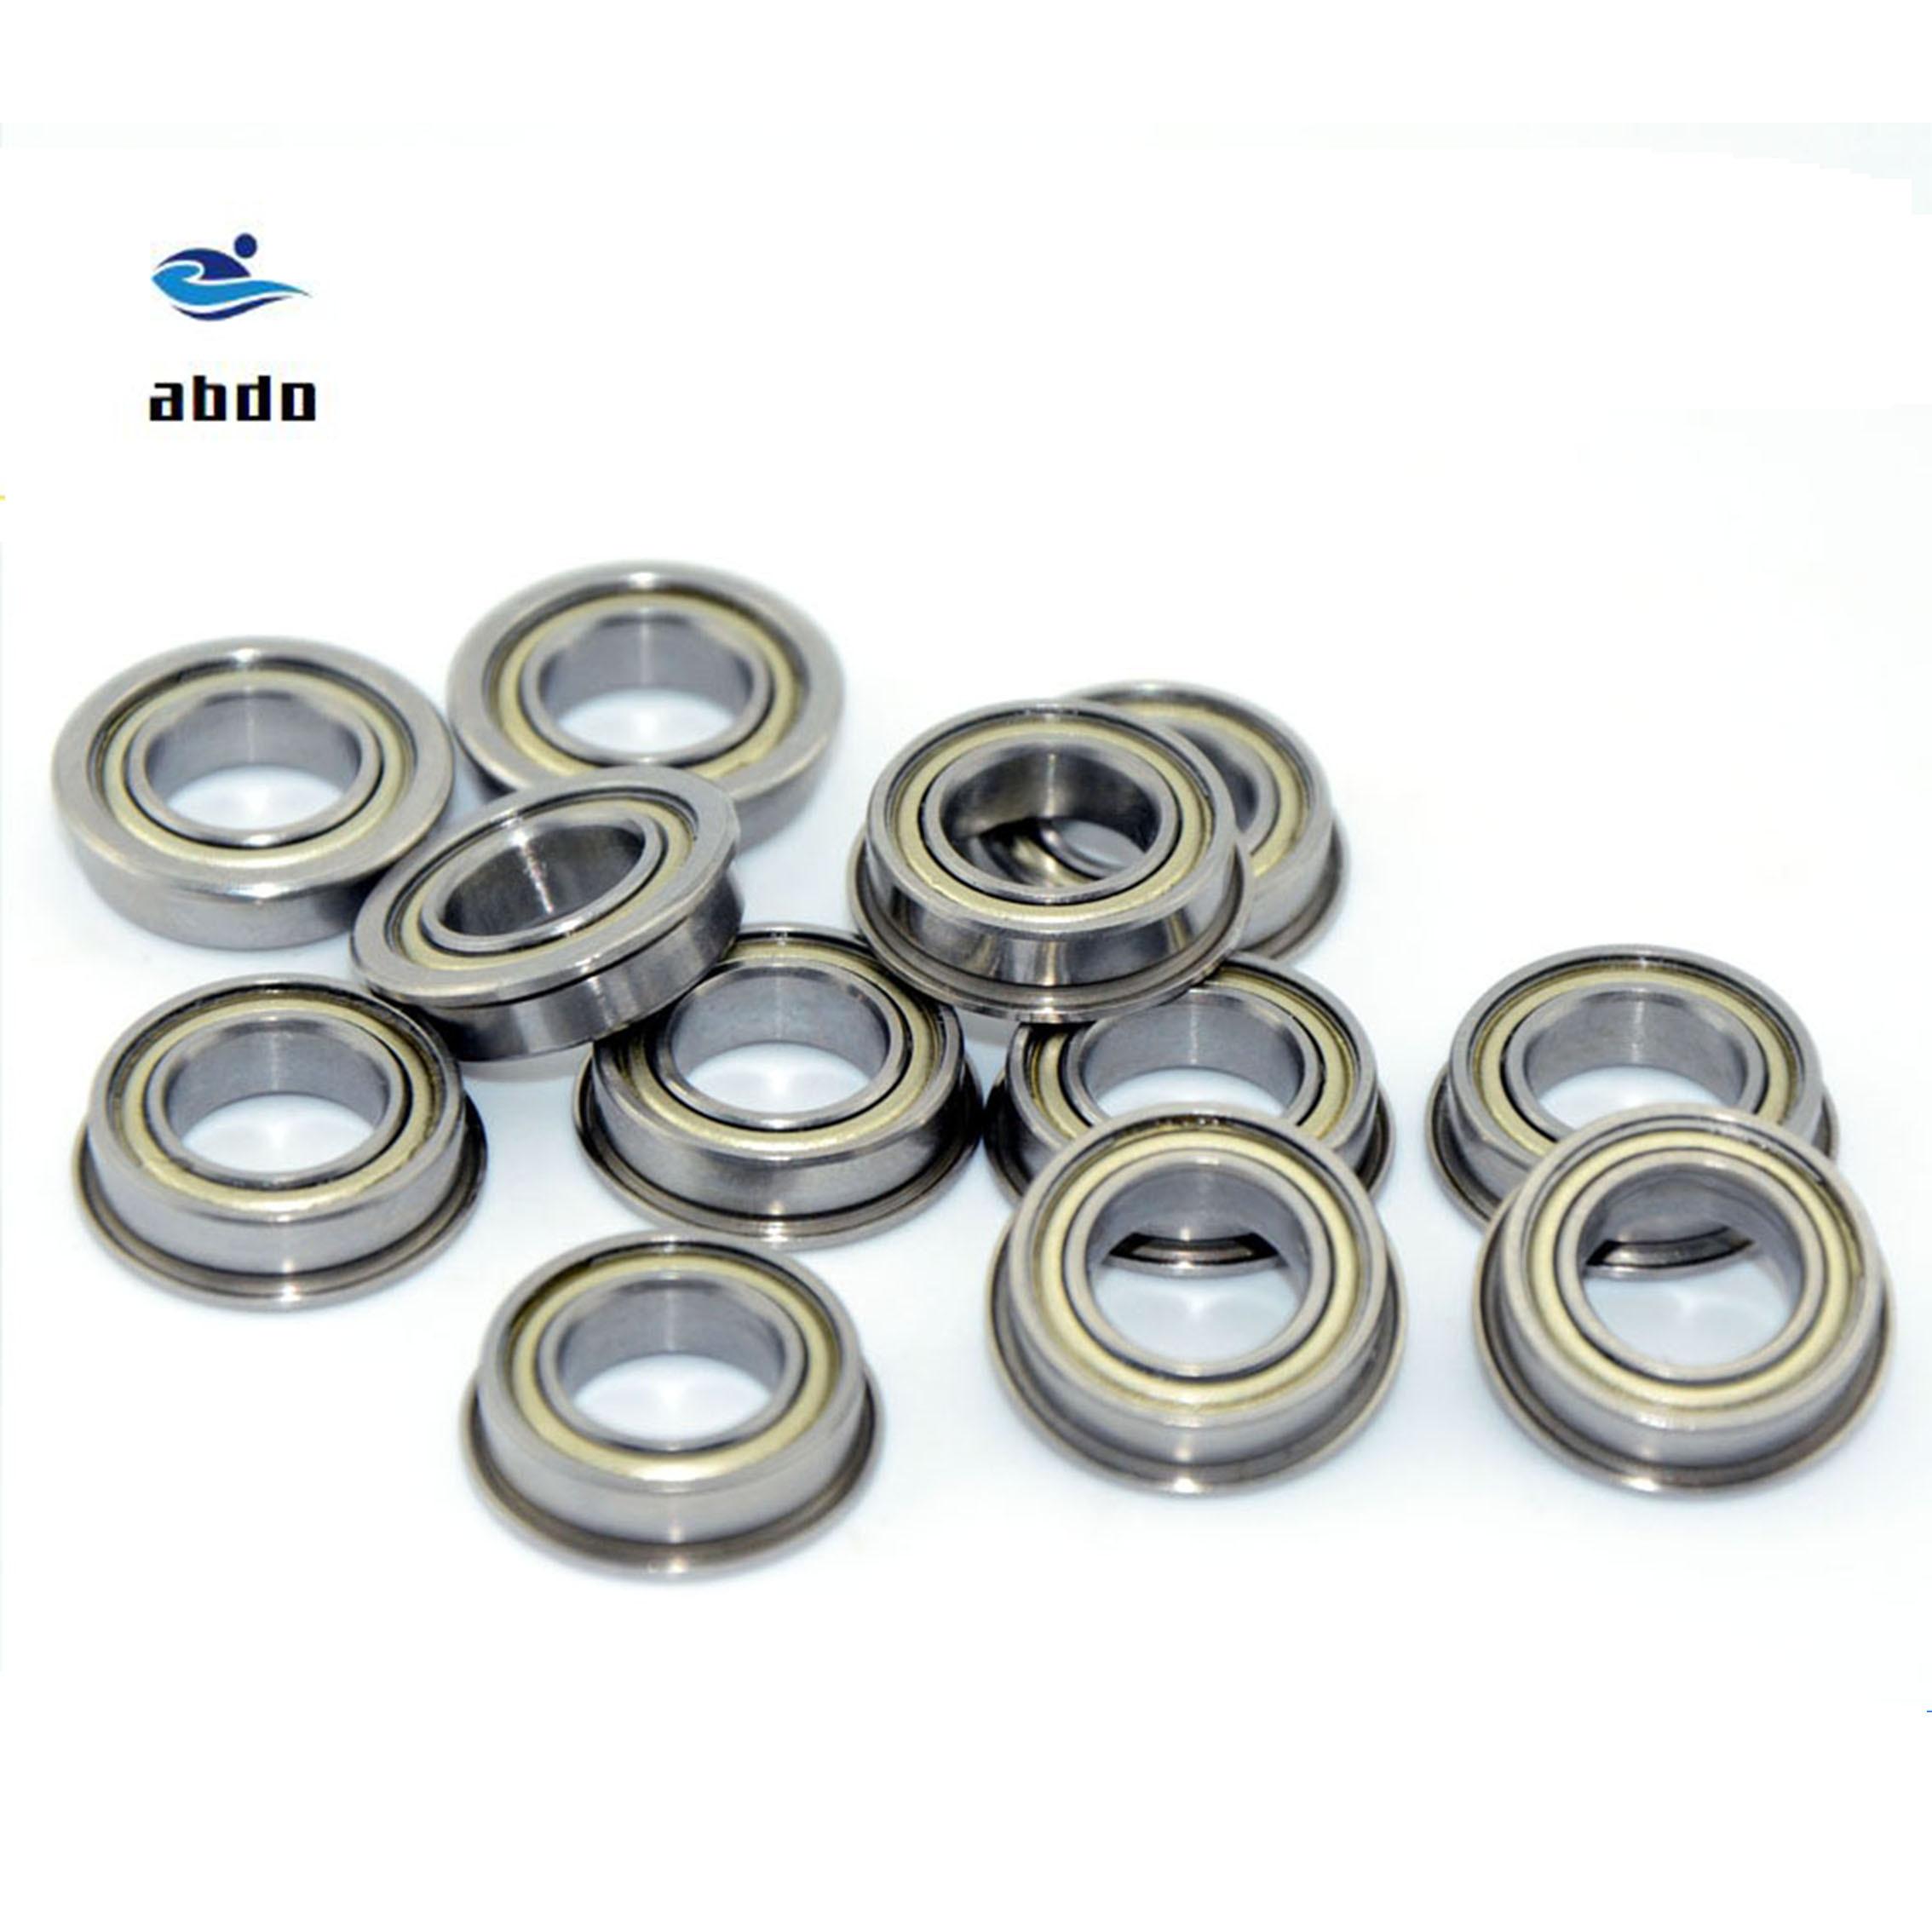 40pcs/Lot MF74ZZ  MF74 ZZ 4x7x2.5mm Miniature Flange Bearing Thin Wall Deep Groove Ball Radial Ball Bearing MF74 bearing